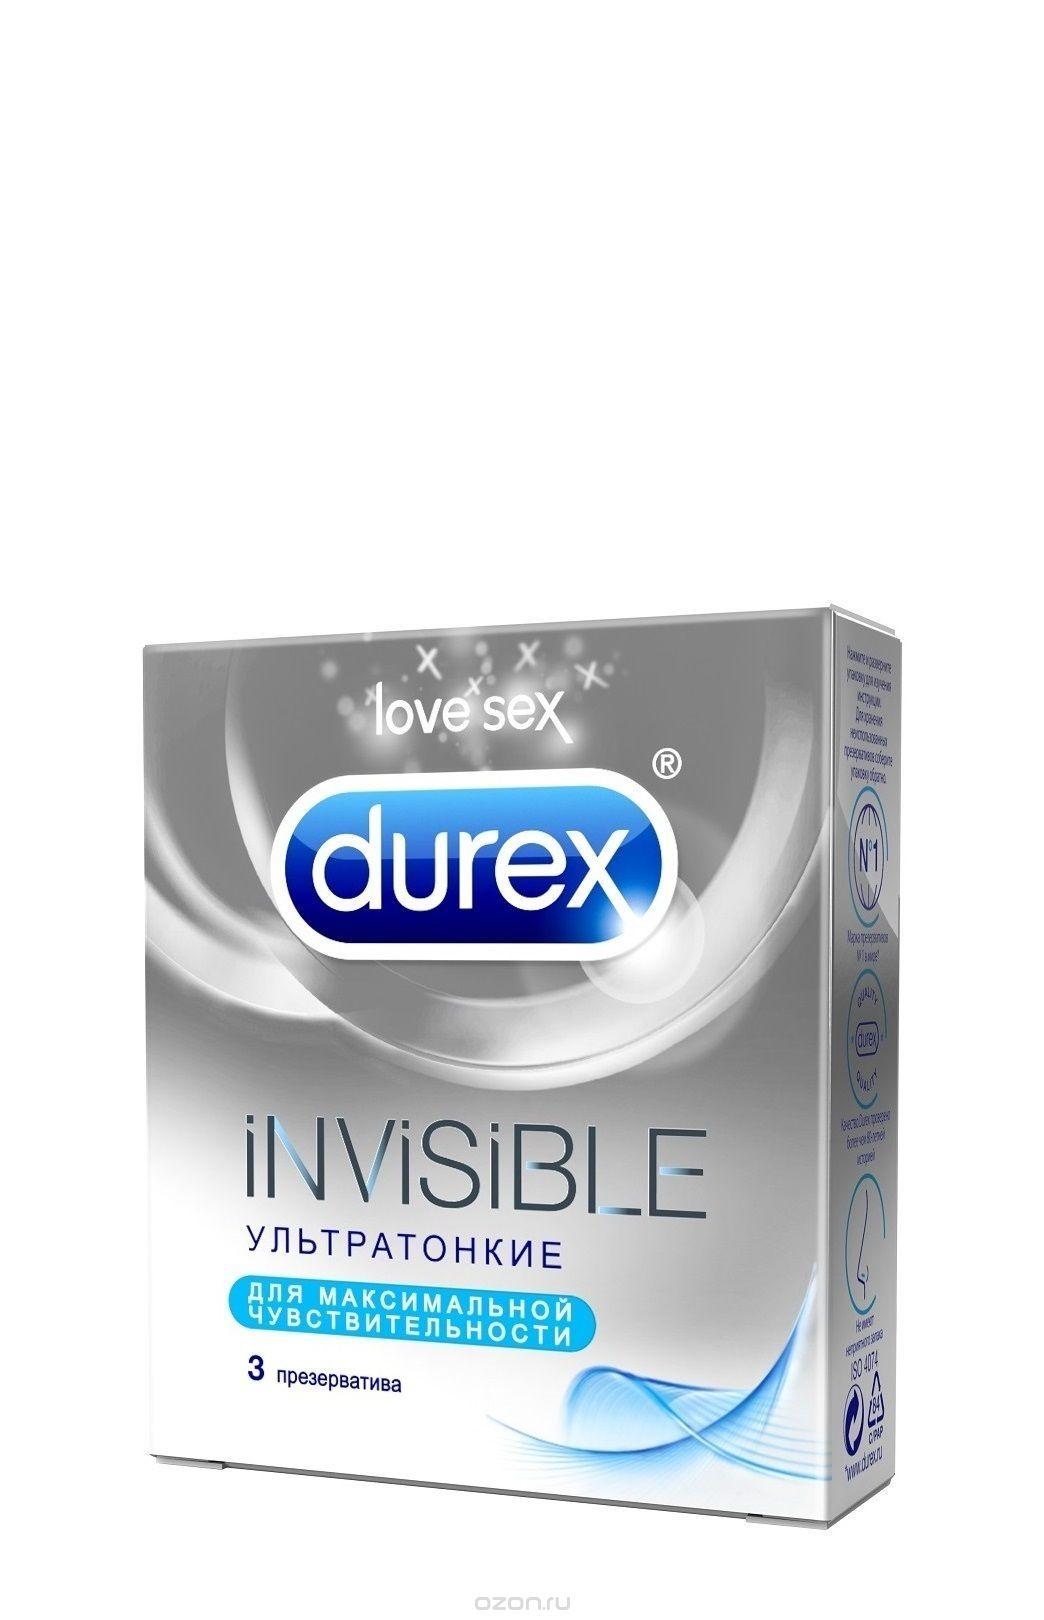 фото упаковки Презервативы Durex Invisible